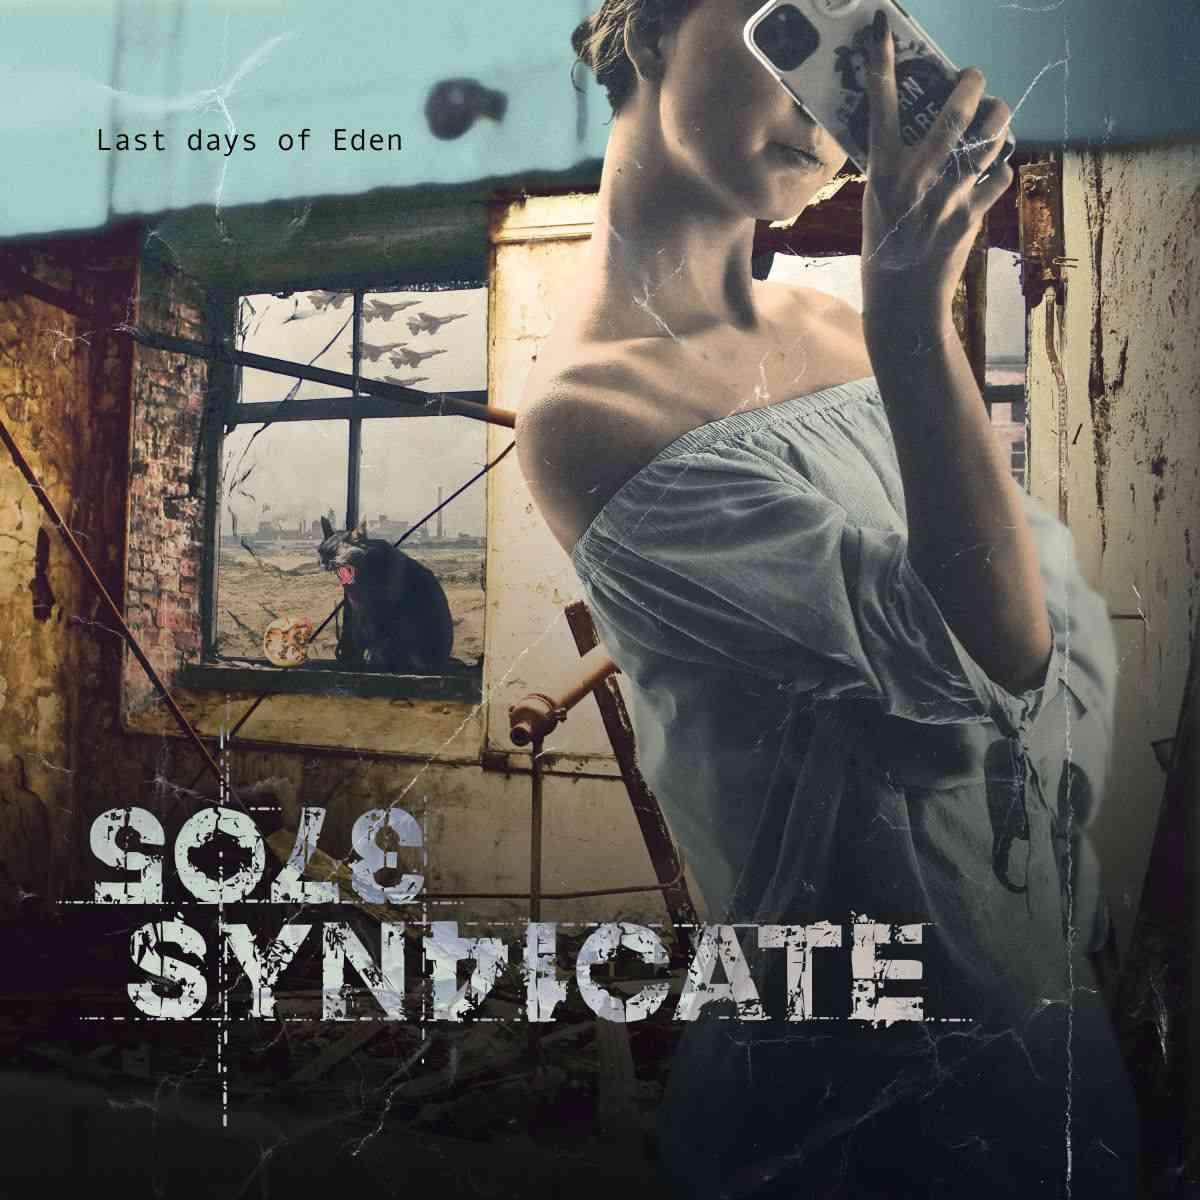 Sole syndicate - last days of eden - album cover